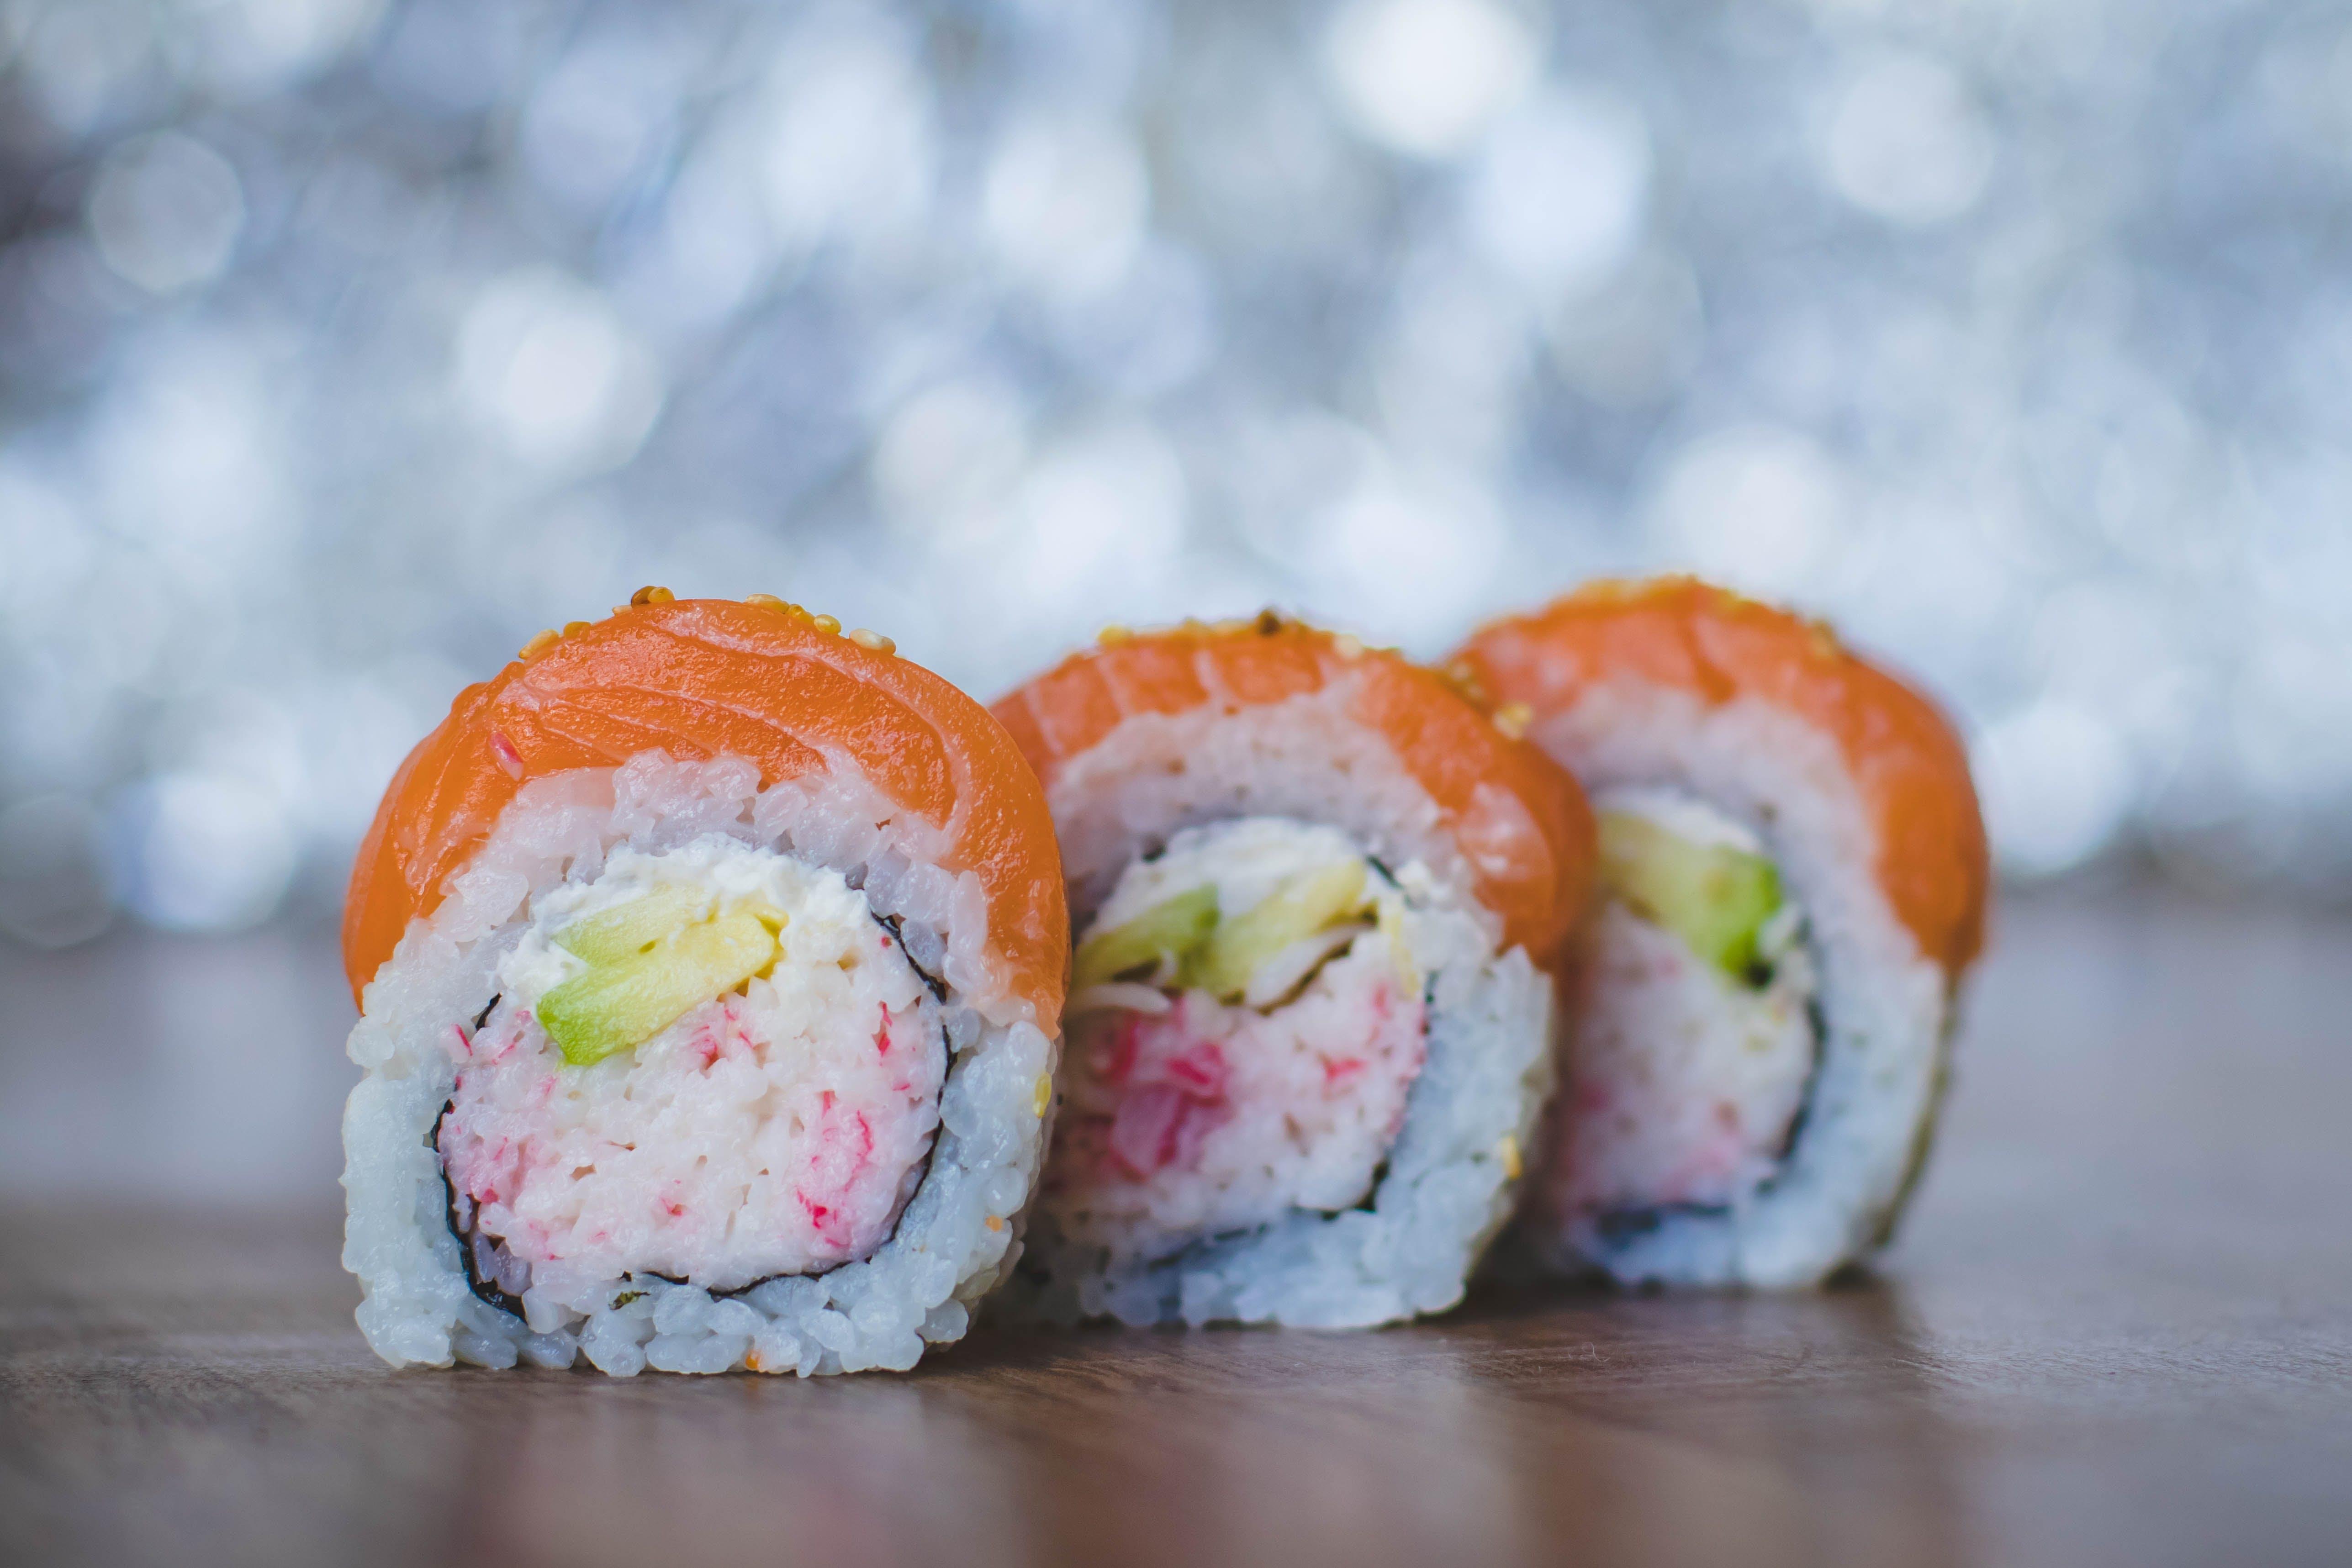 Close-Up Photo of Three Sushi